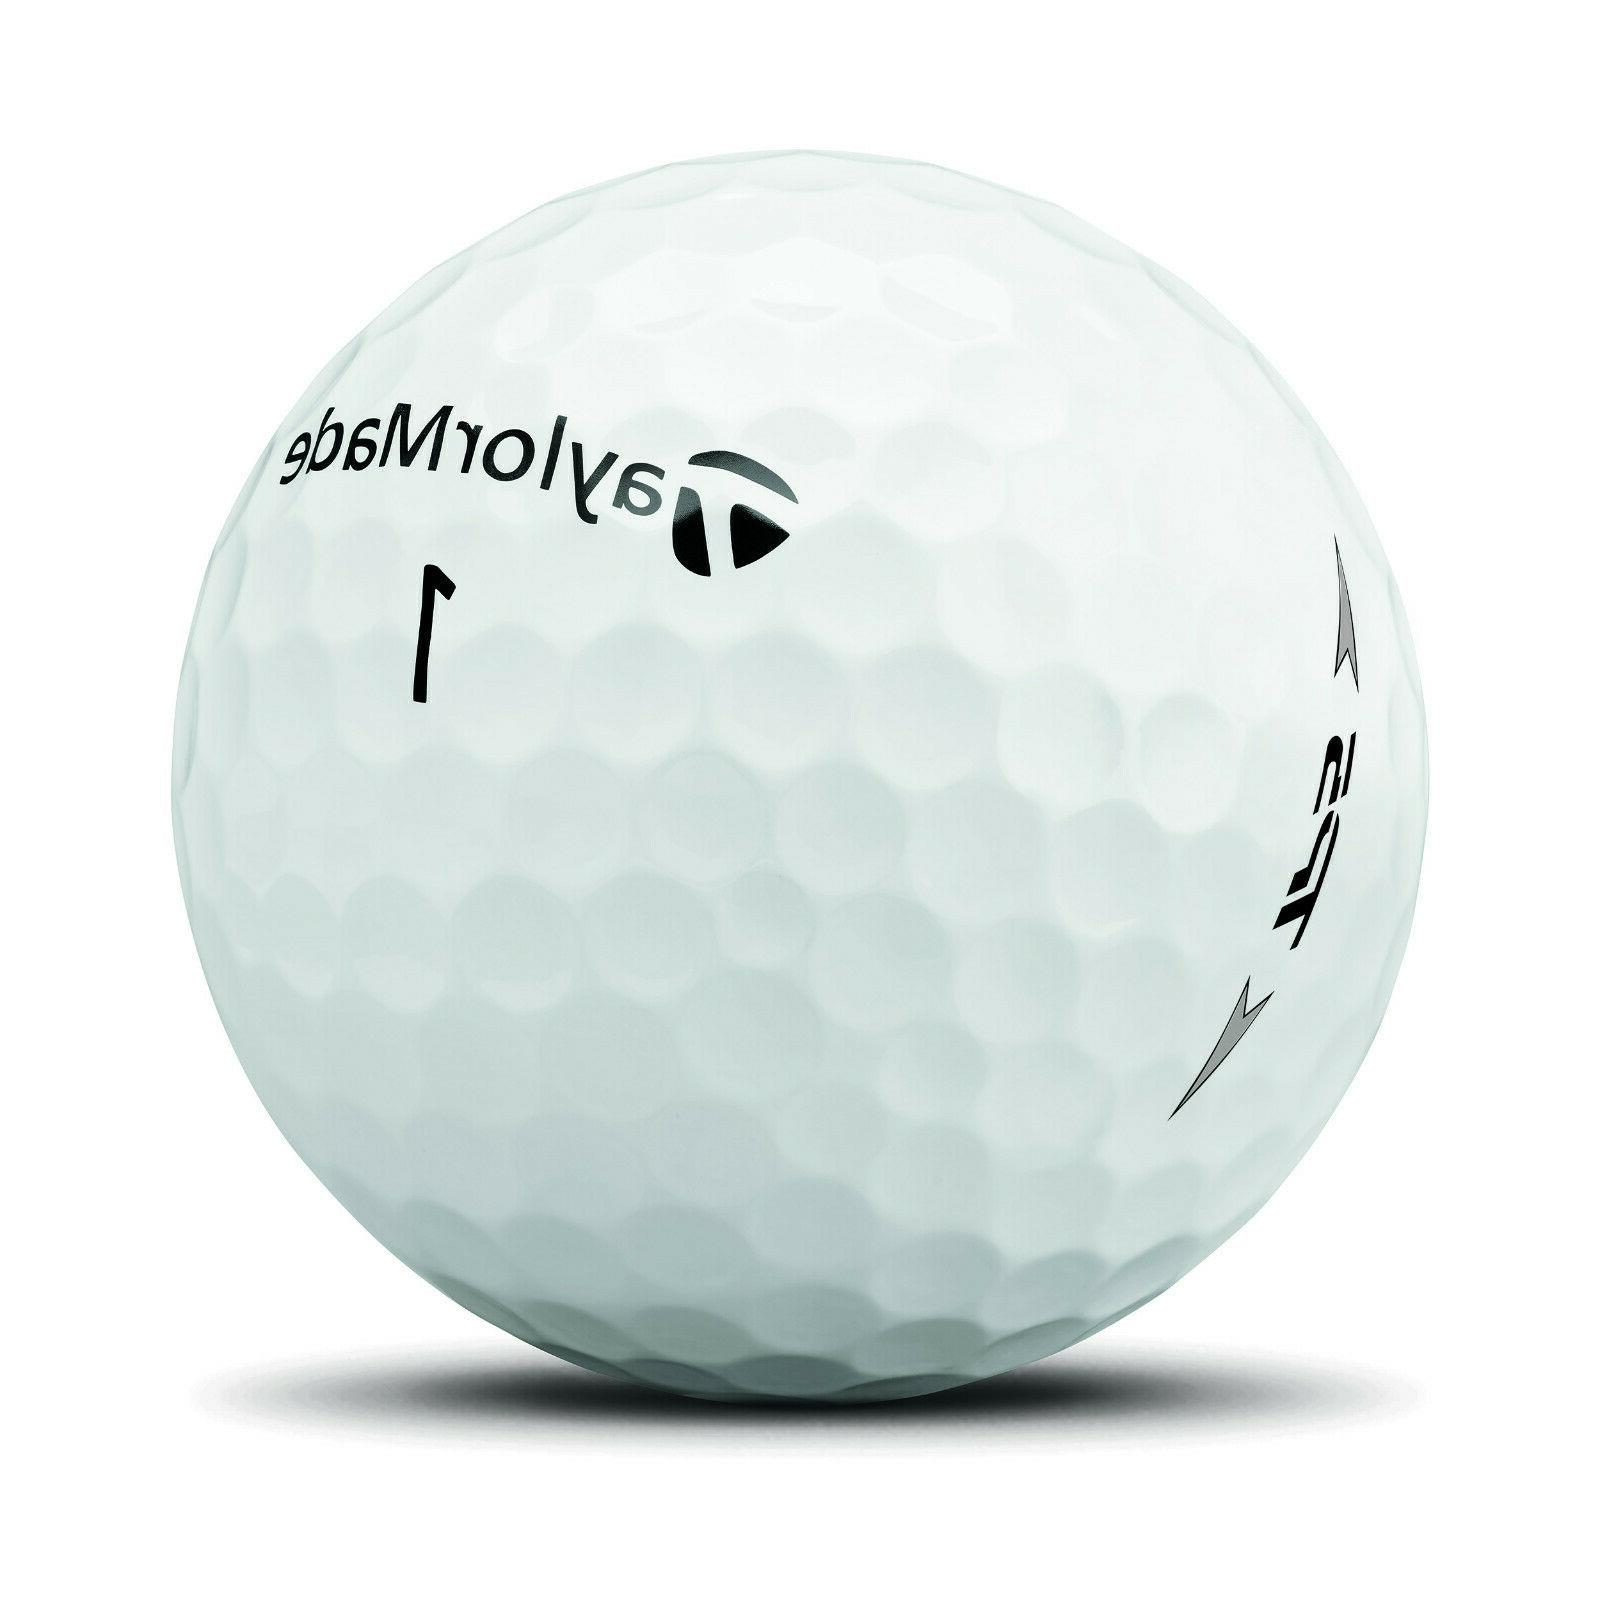 Taylormade TP5 Balls 2019 2